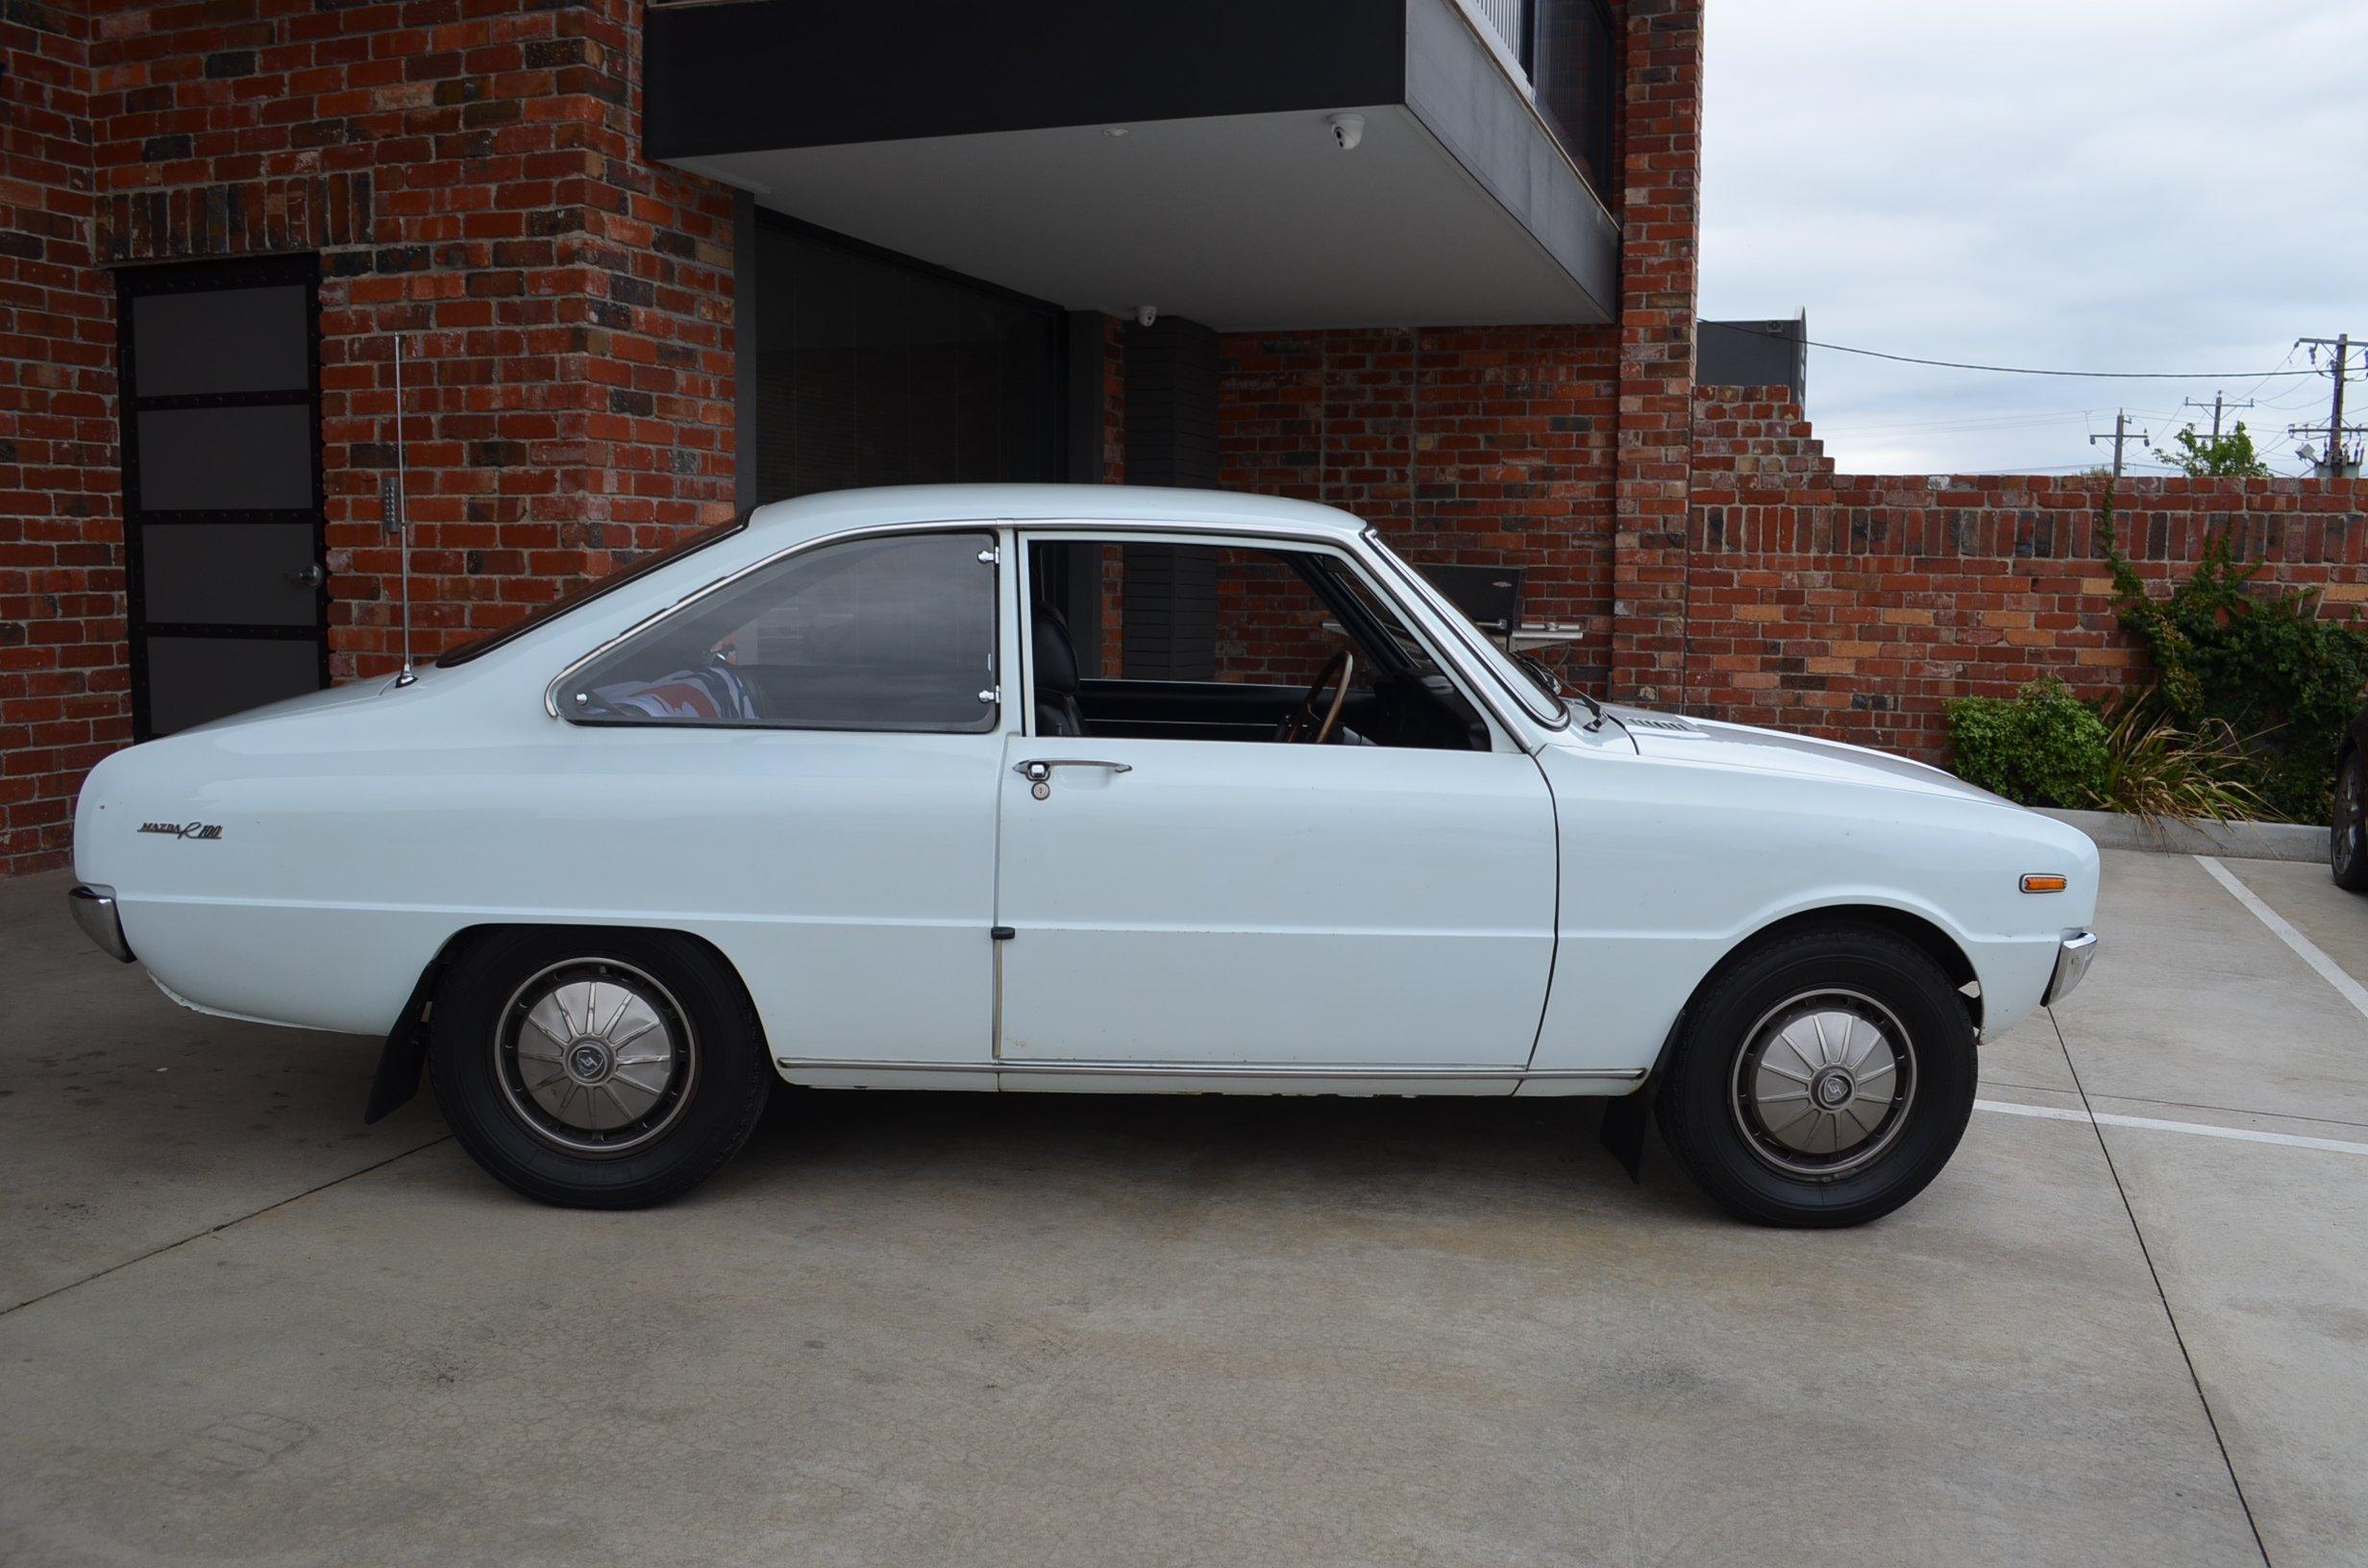 Unrestored 1971 Mazda R100 | Muscle Car Sales